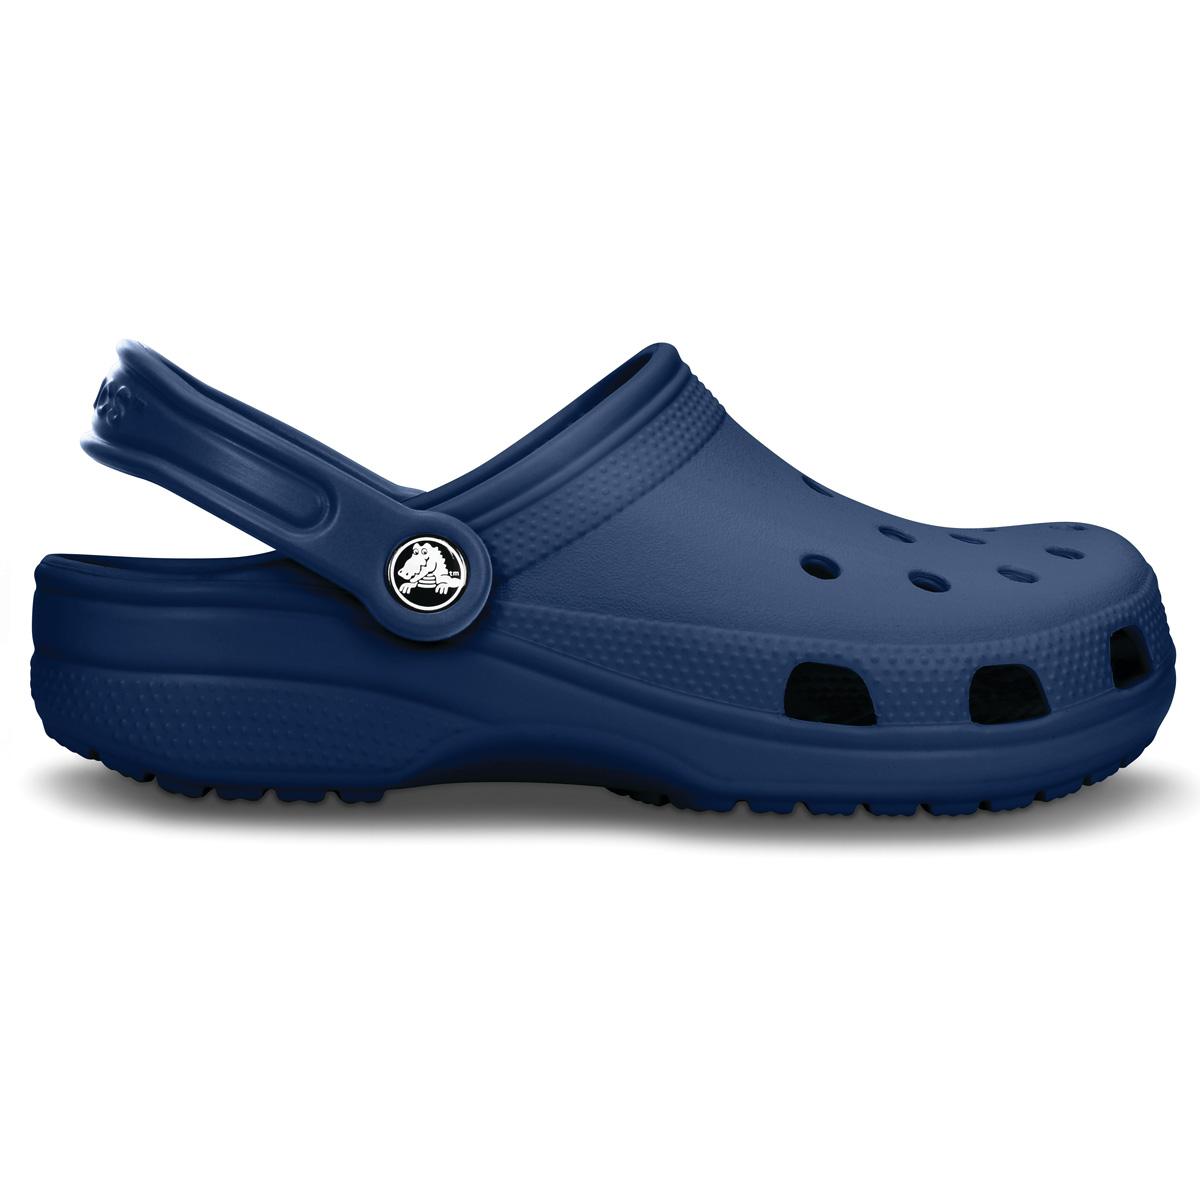 Crocs Classic - Lacivert